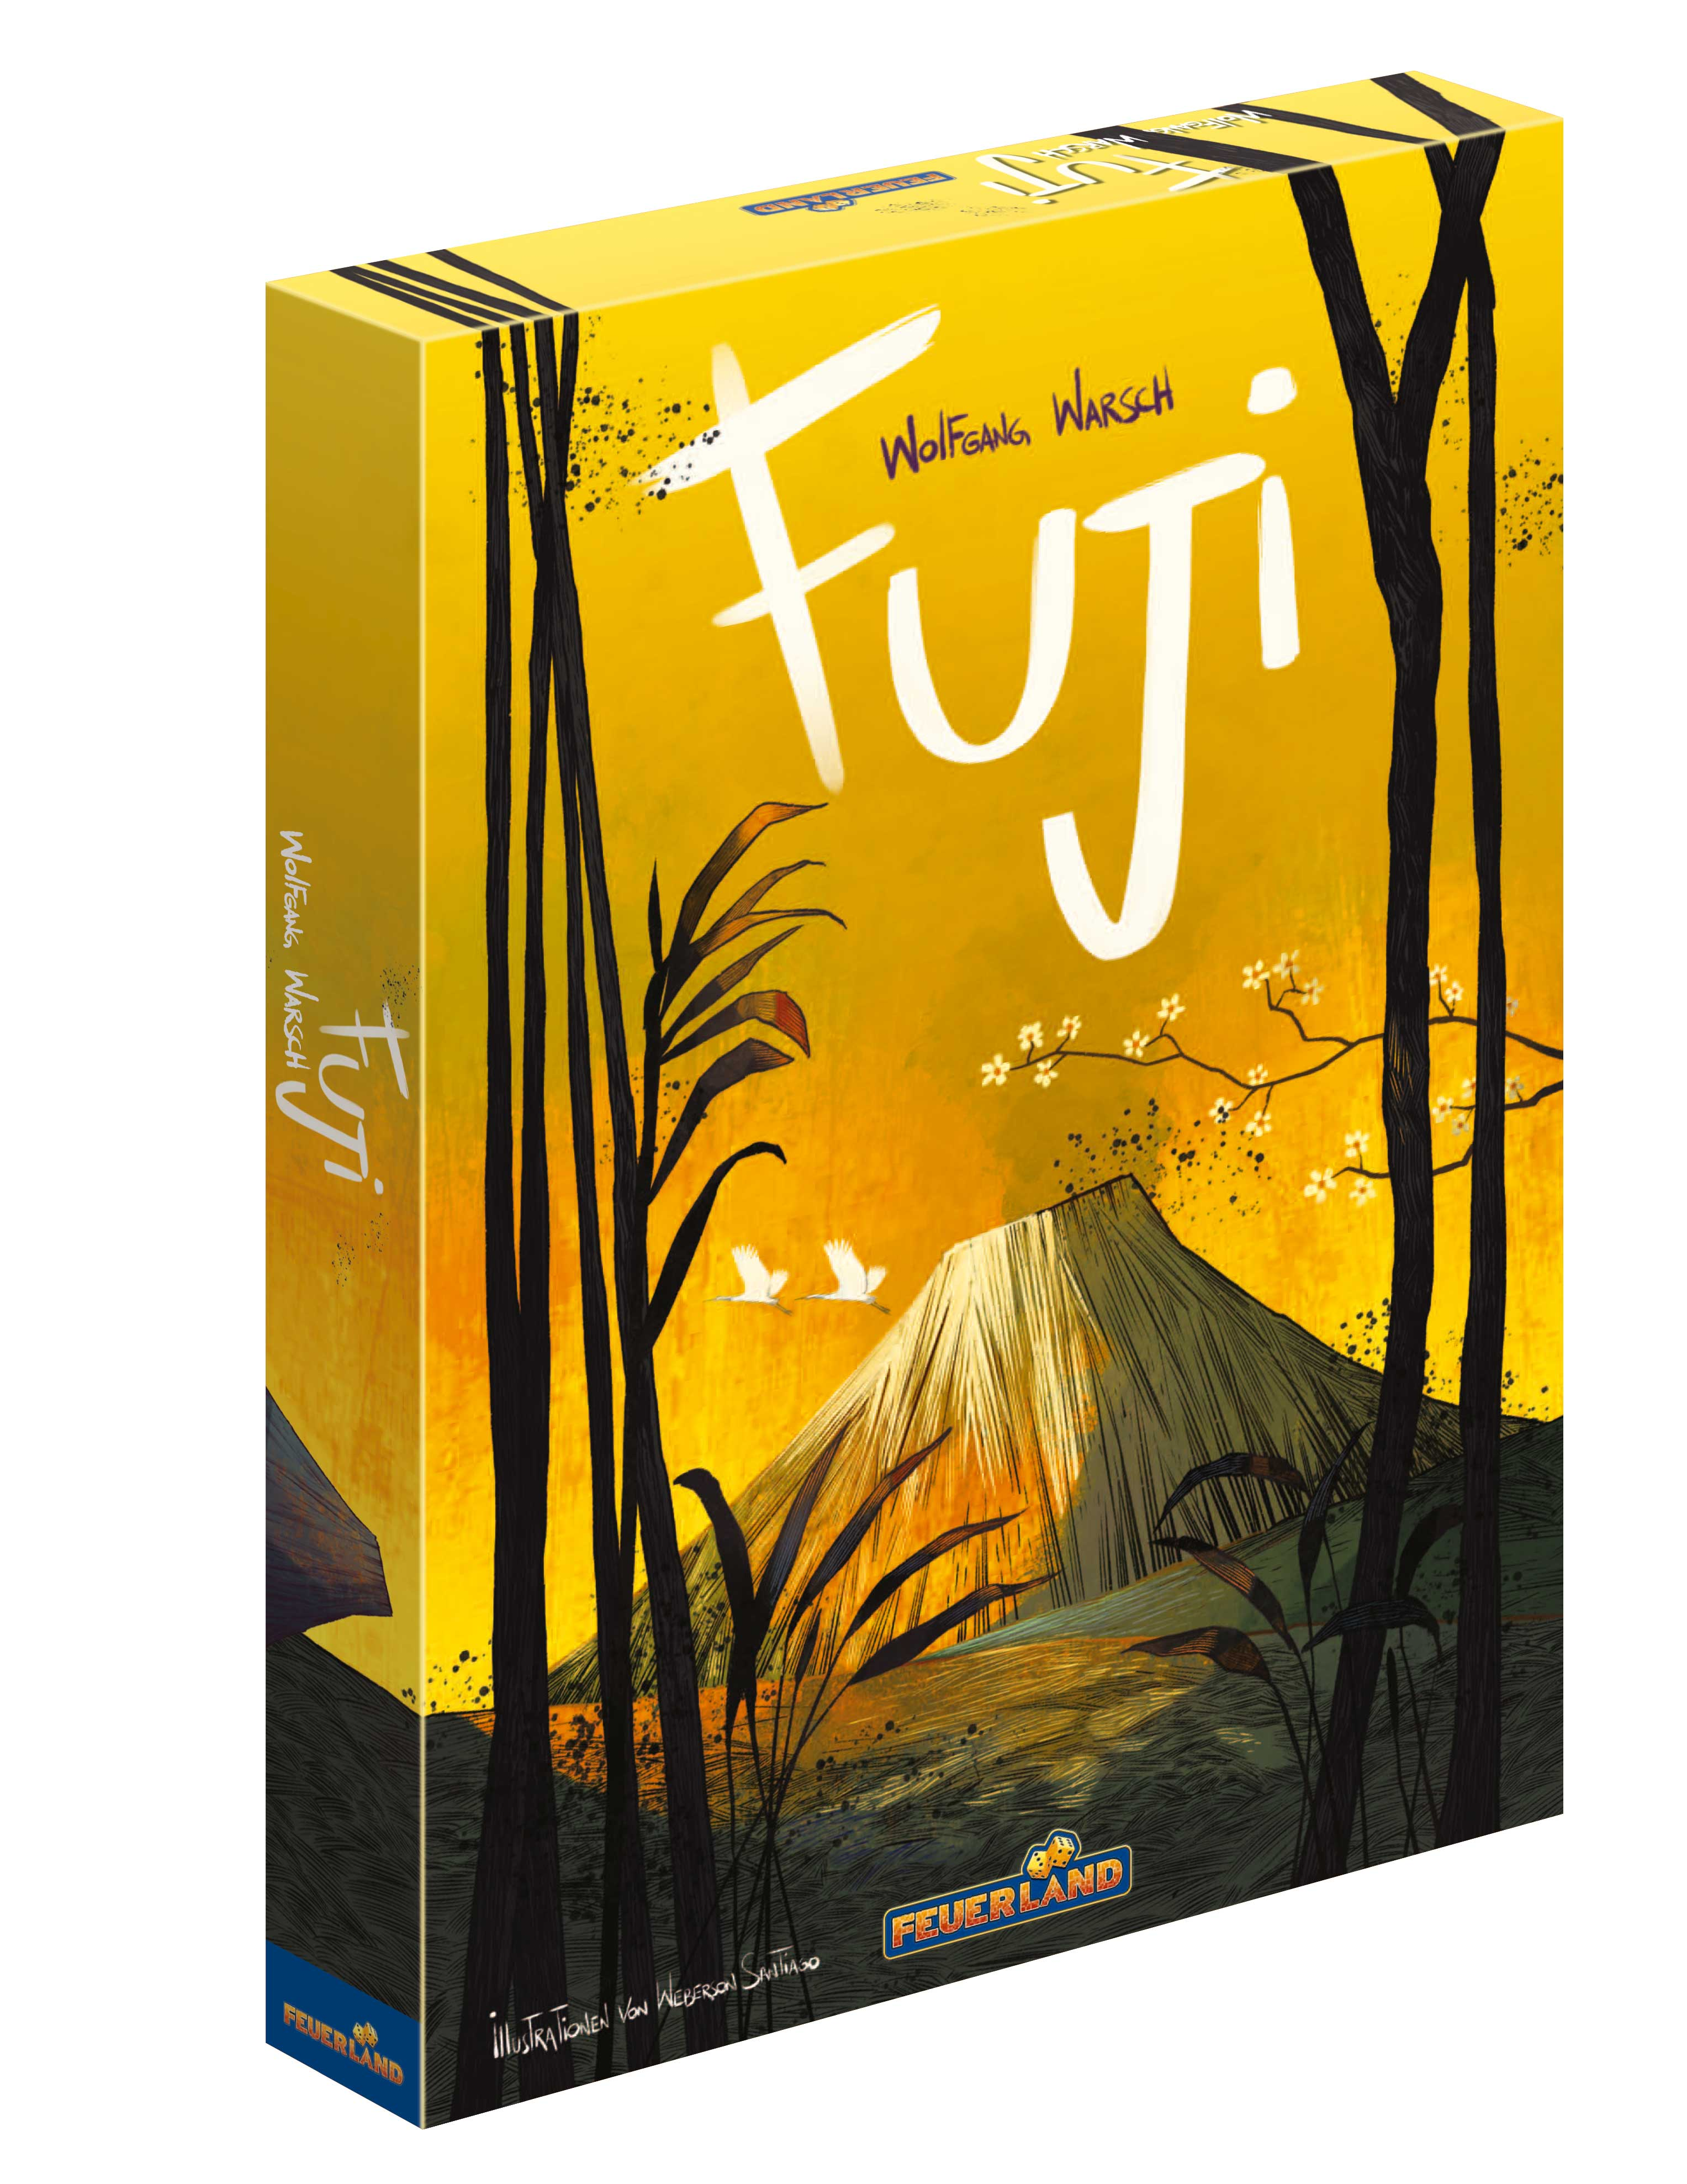 Fuji Box